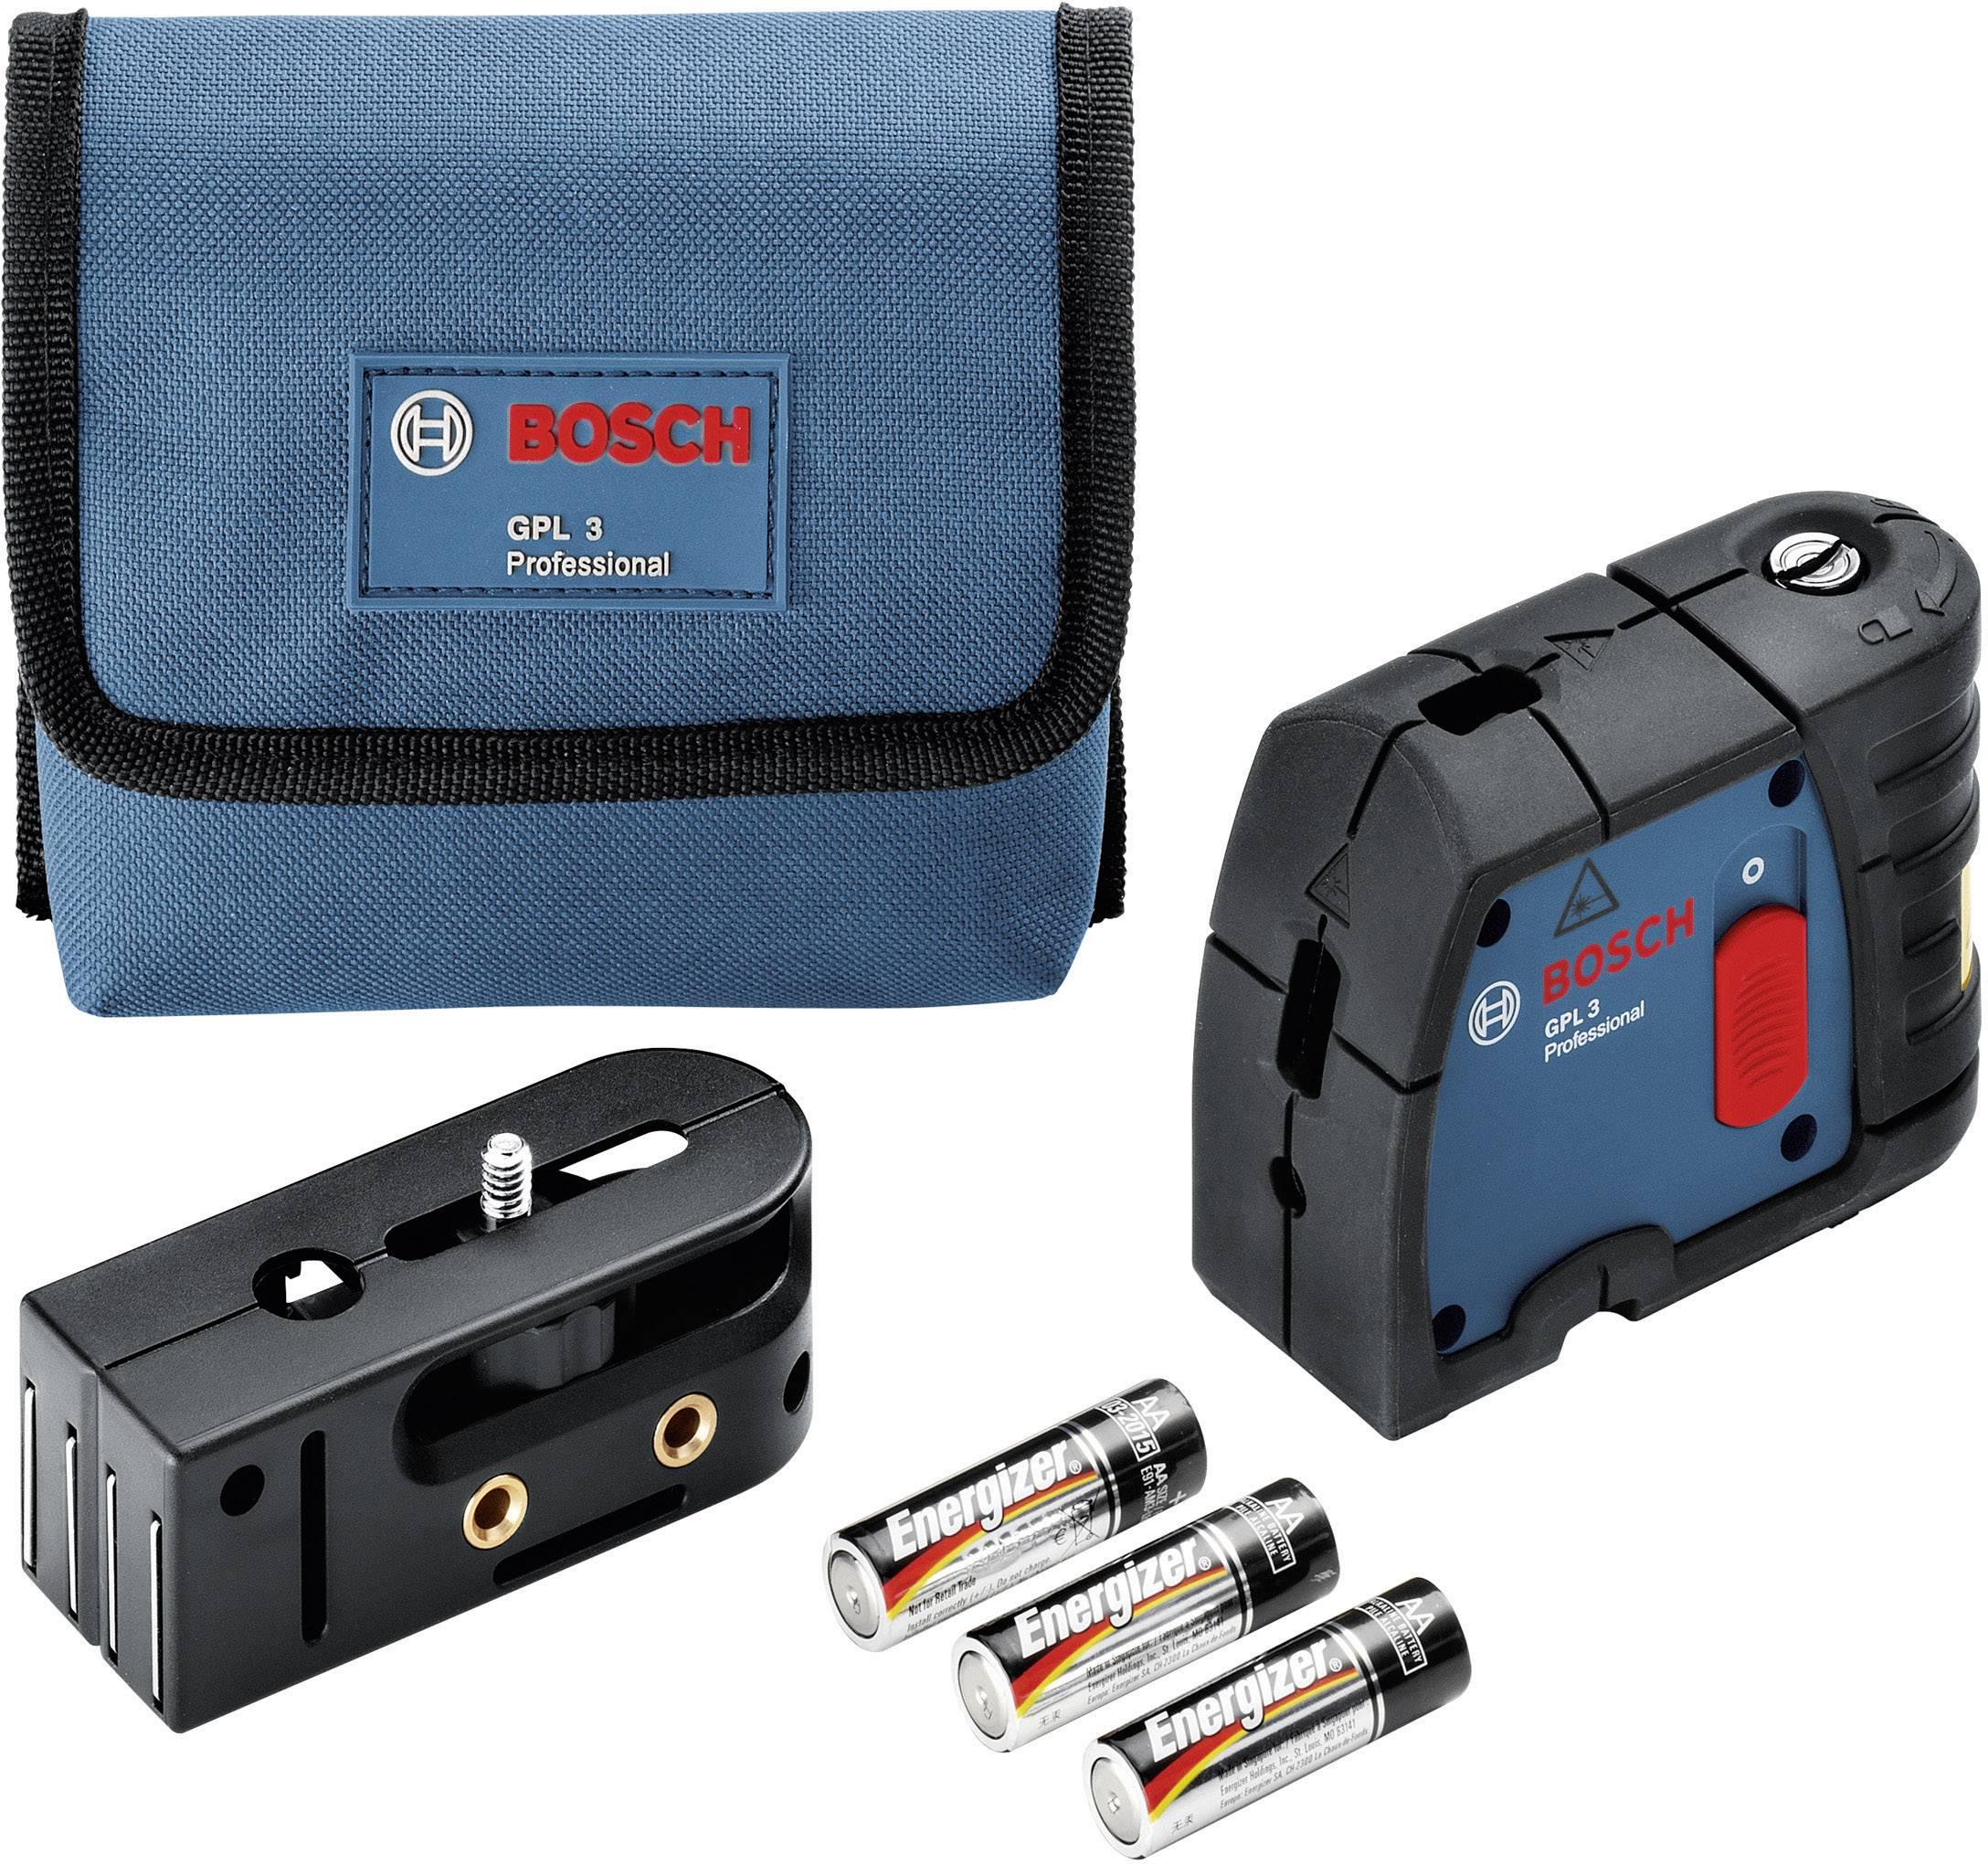 Bodový laser samonivelačná Bosch Professional GPL 3, dosah (max.): 30 m